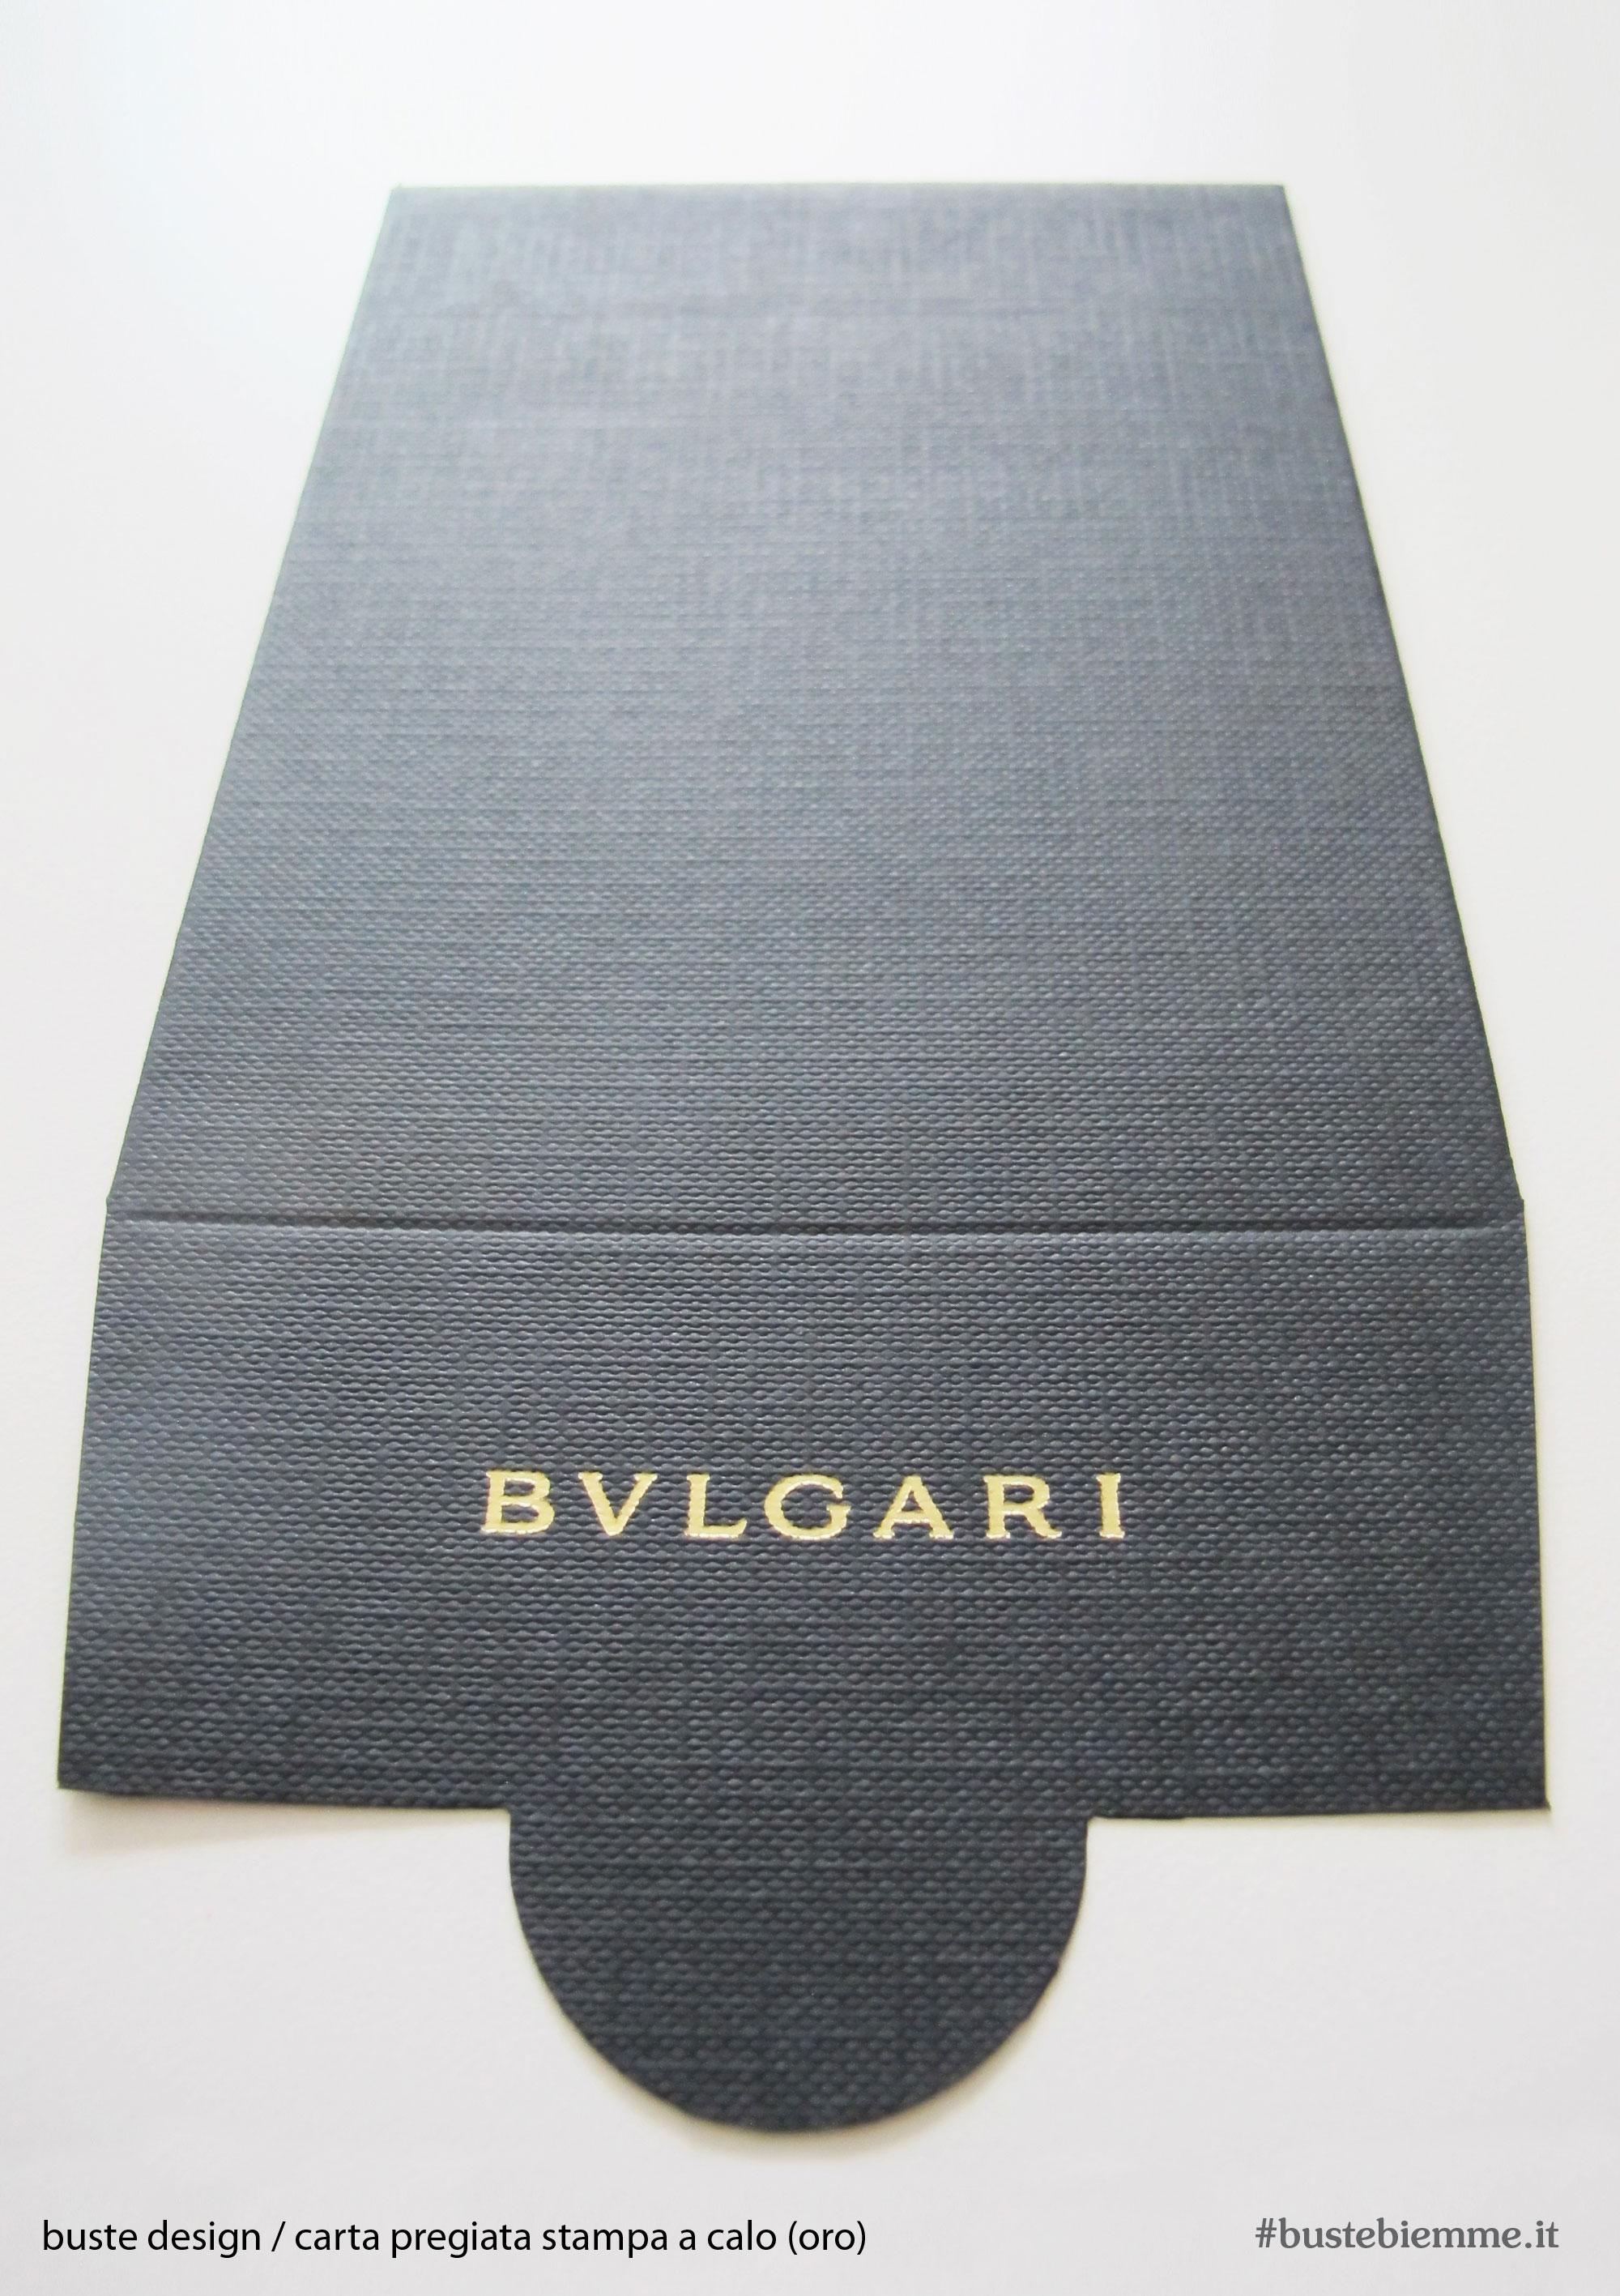 busta design carta con trama tessile e stampa oro a caldo